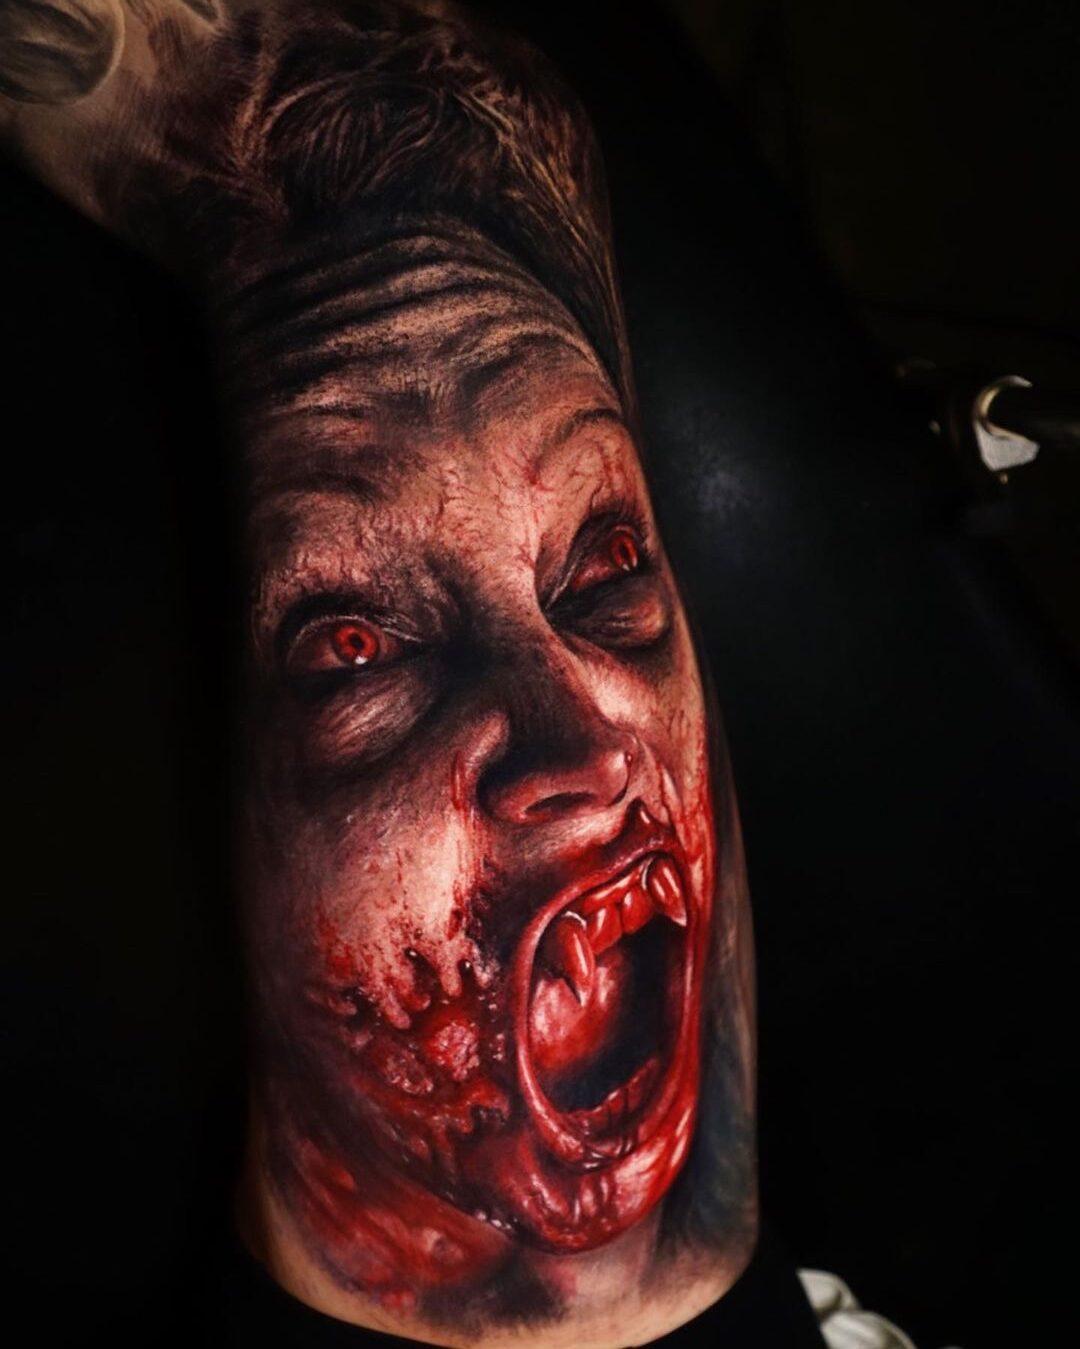 Adrian Sanchez, Chinatown Tattoo, Madrid, Spain